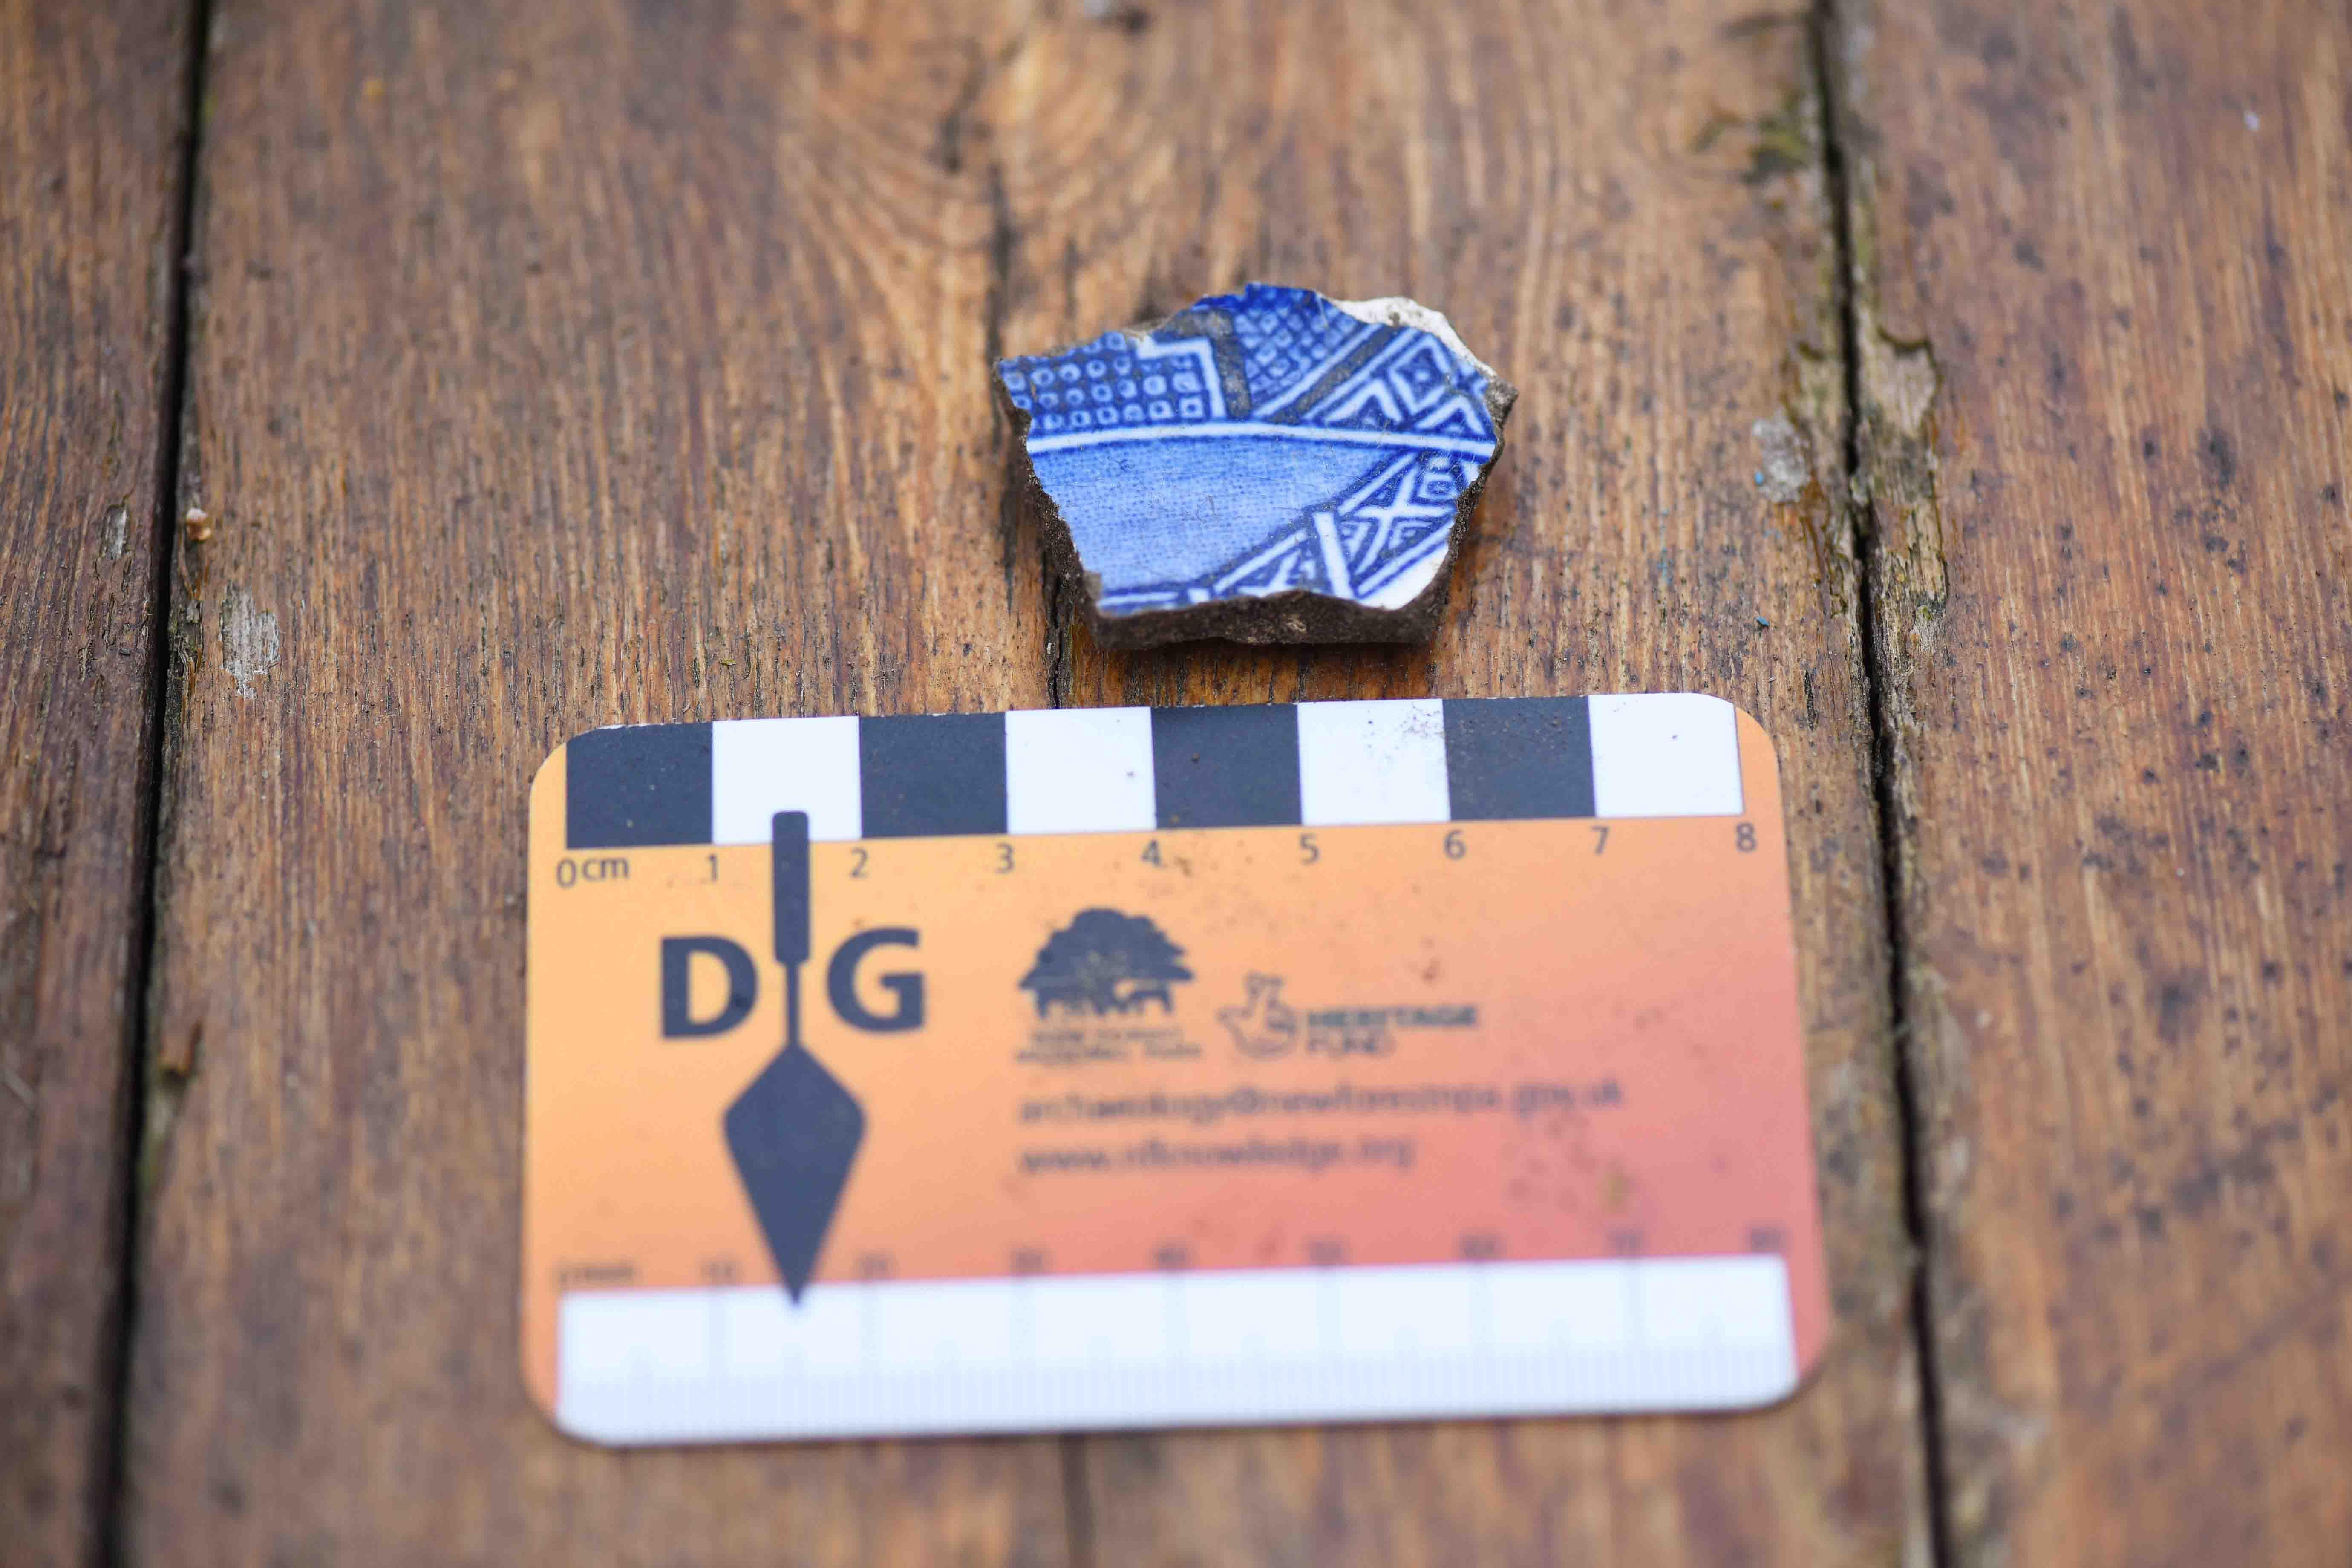 Dig Burley find: pottery